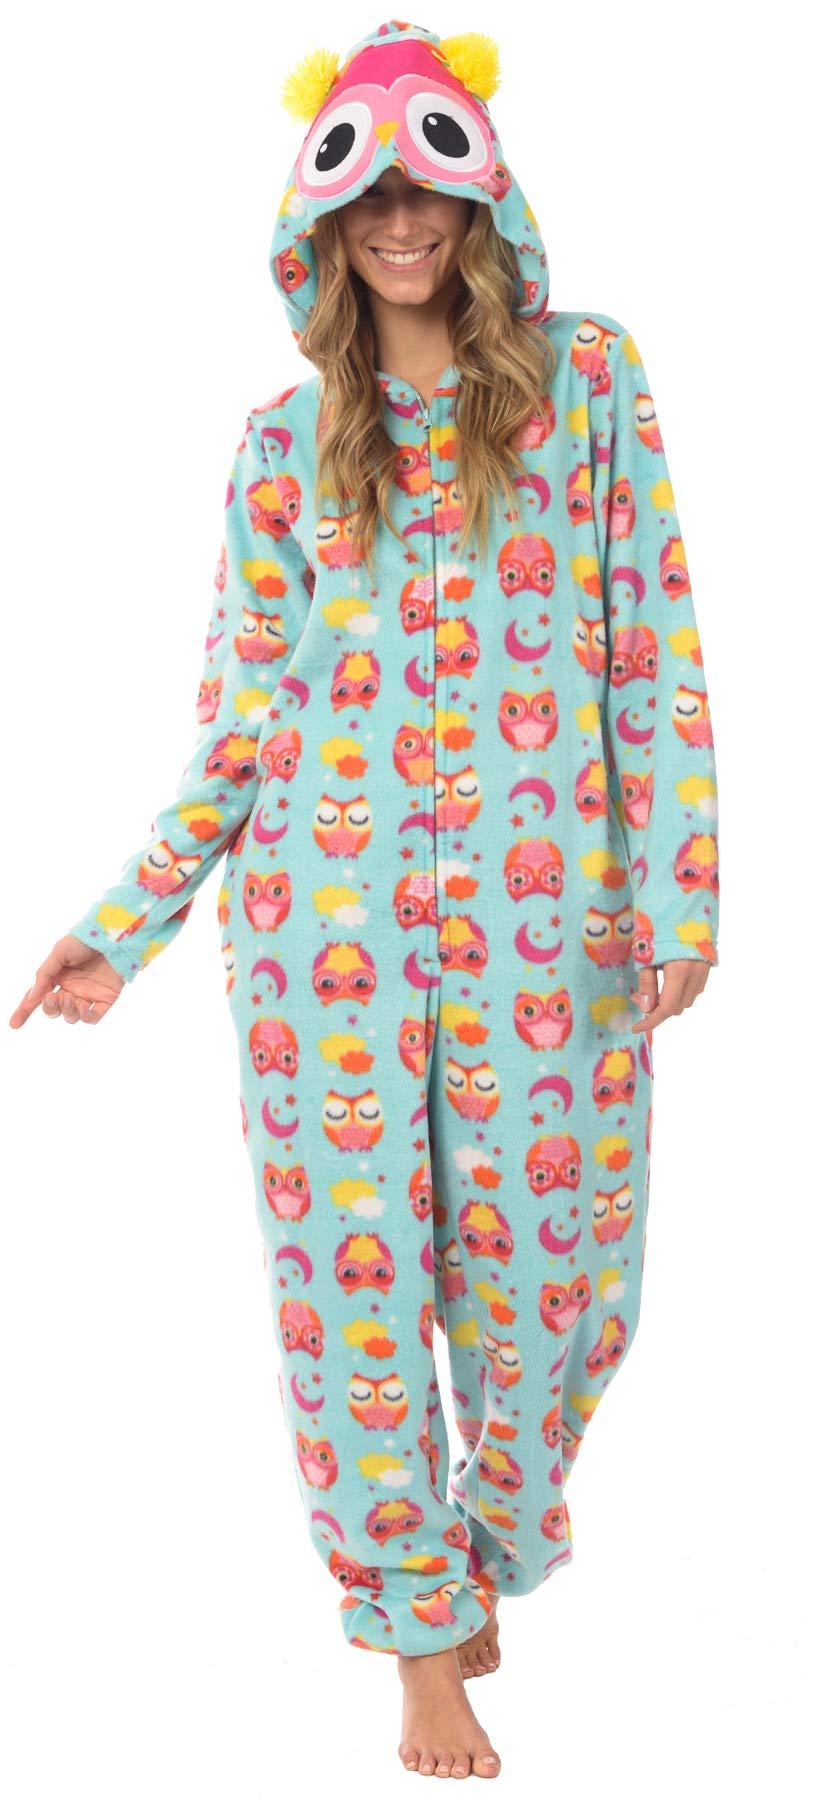 Body Candy Loungewear Ladies Onesie (Whooty, Small) by Body Candy Loungewear